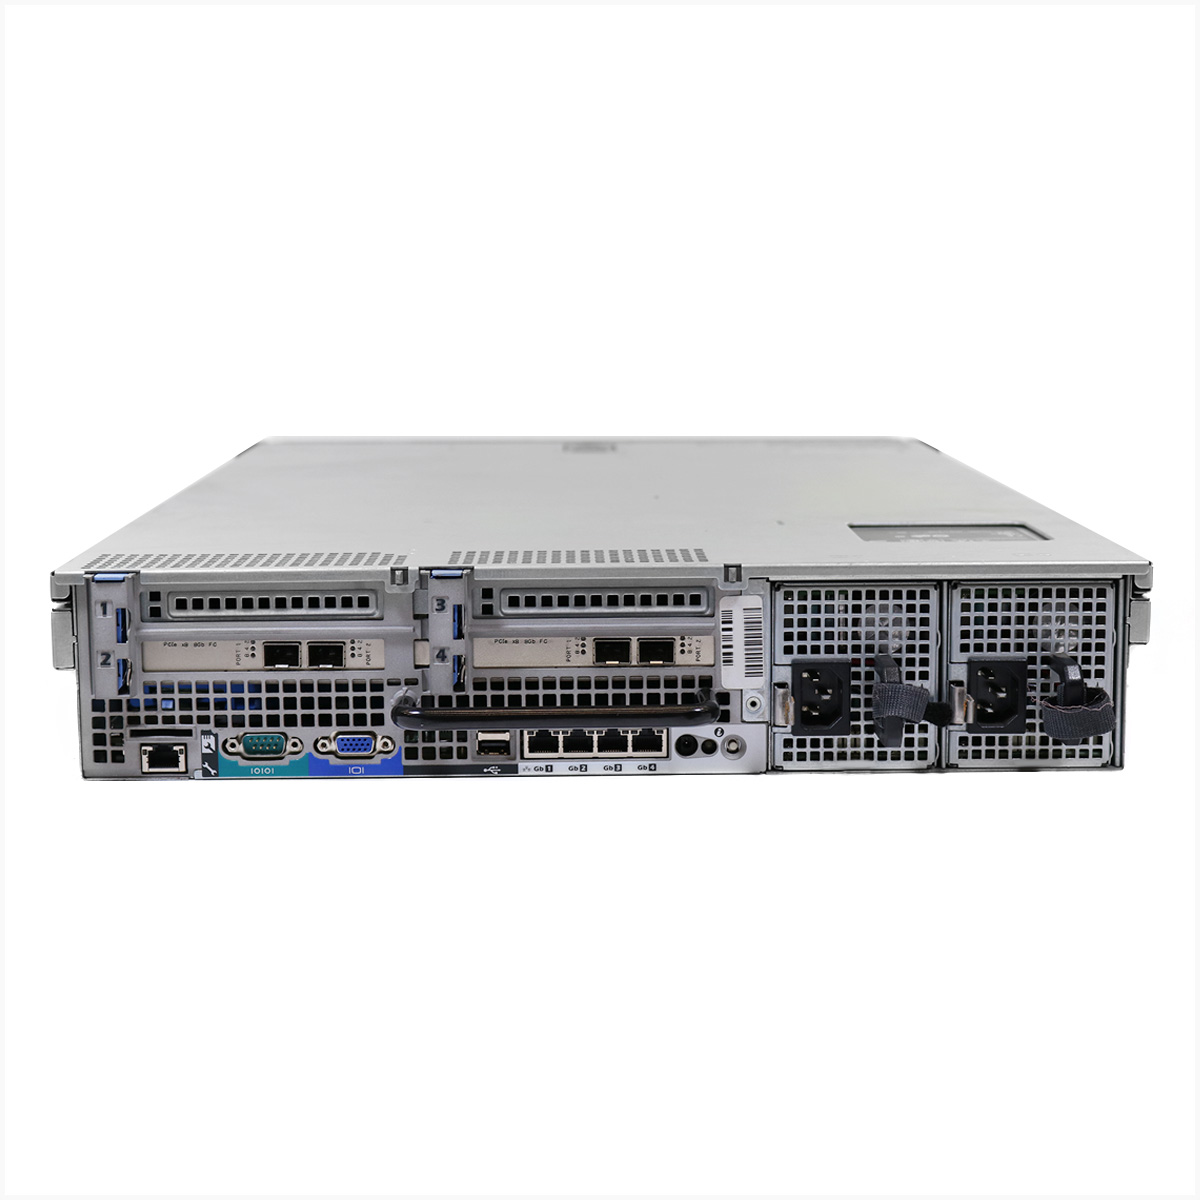 Servidor dell r710 xeon x5570 64gb 2x 1tb - usado